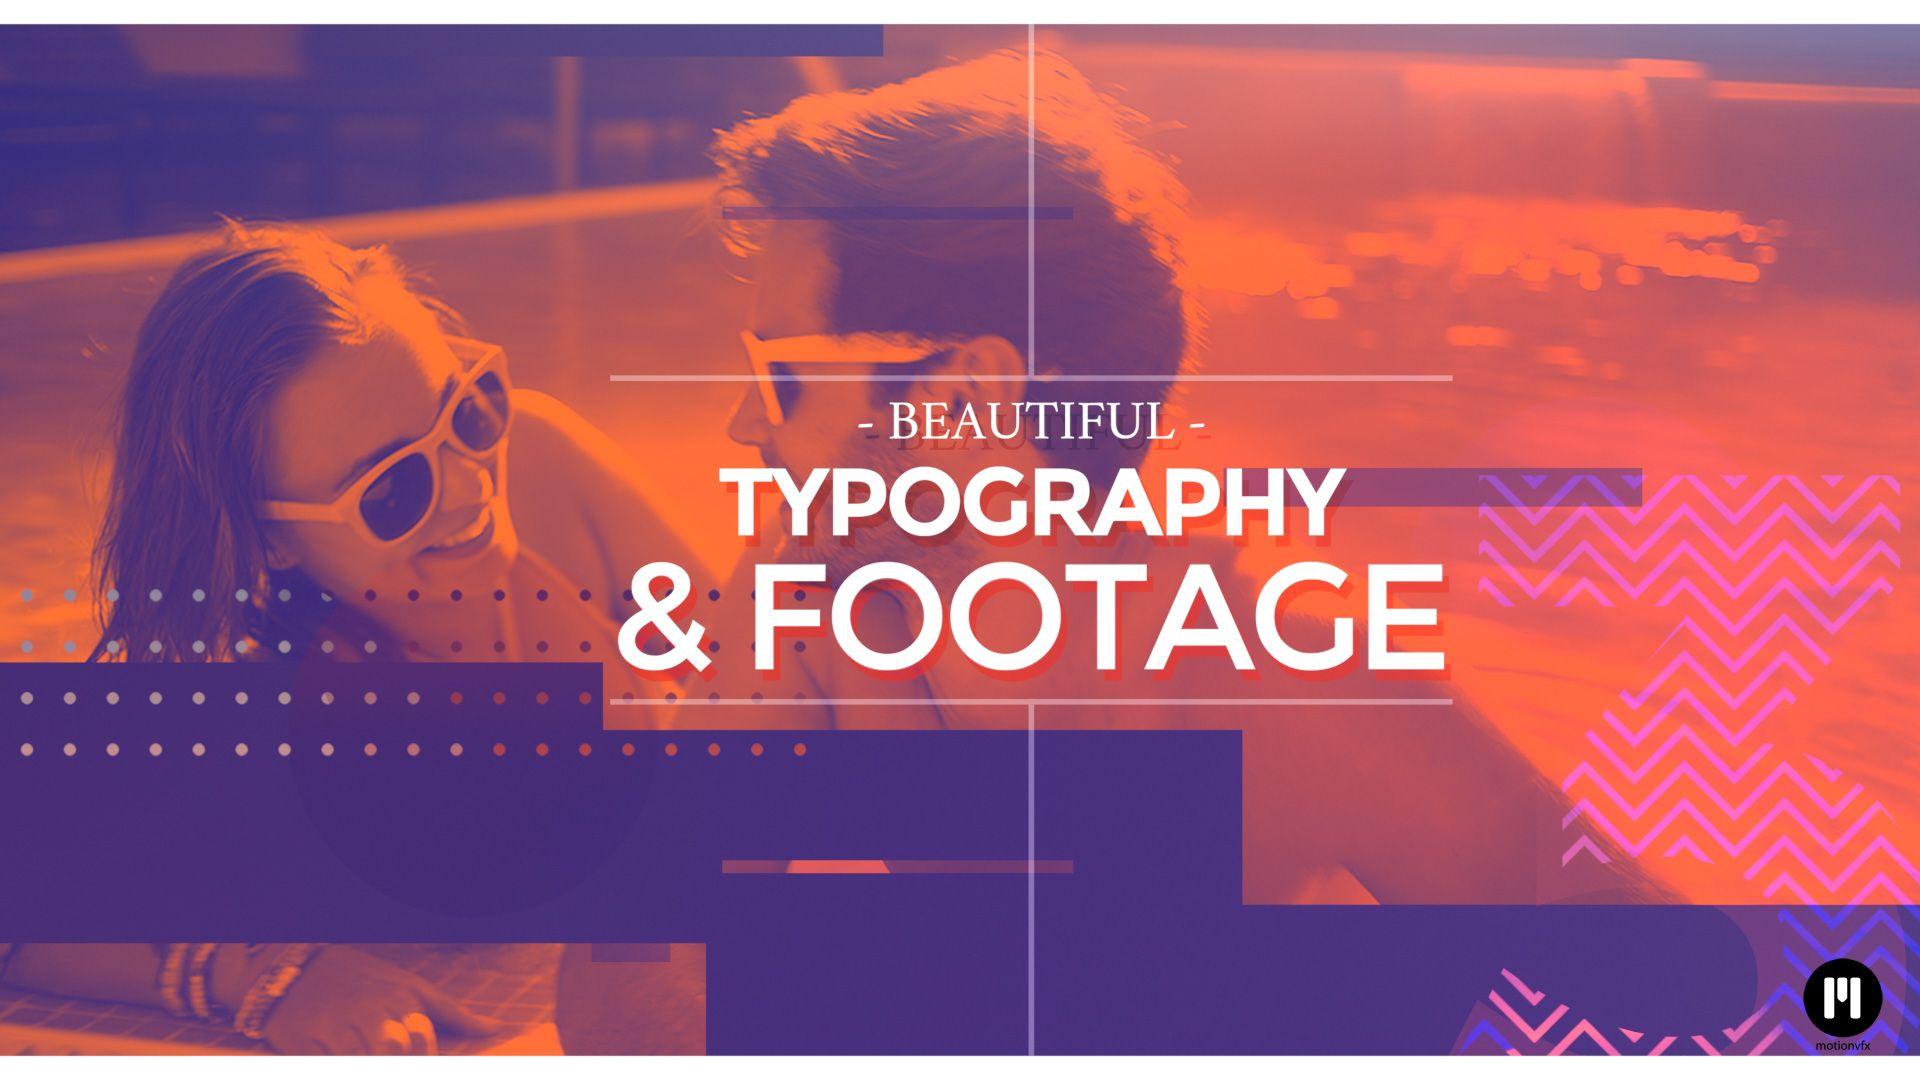 New Template! Multicolored Slideshow - www.motionvfx.com/N2058 #Motion5 #FinalCutProX #FCPX #Motion5 #Apple #Design